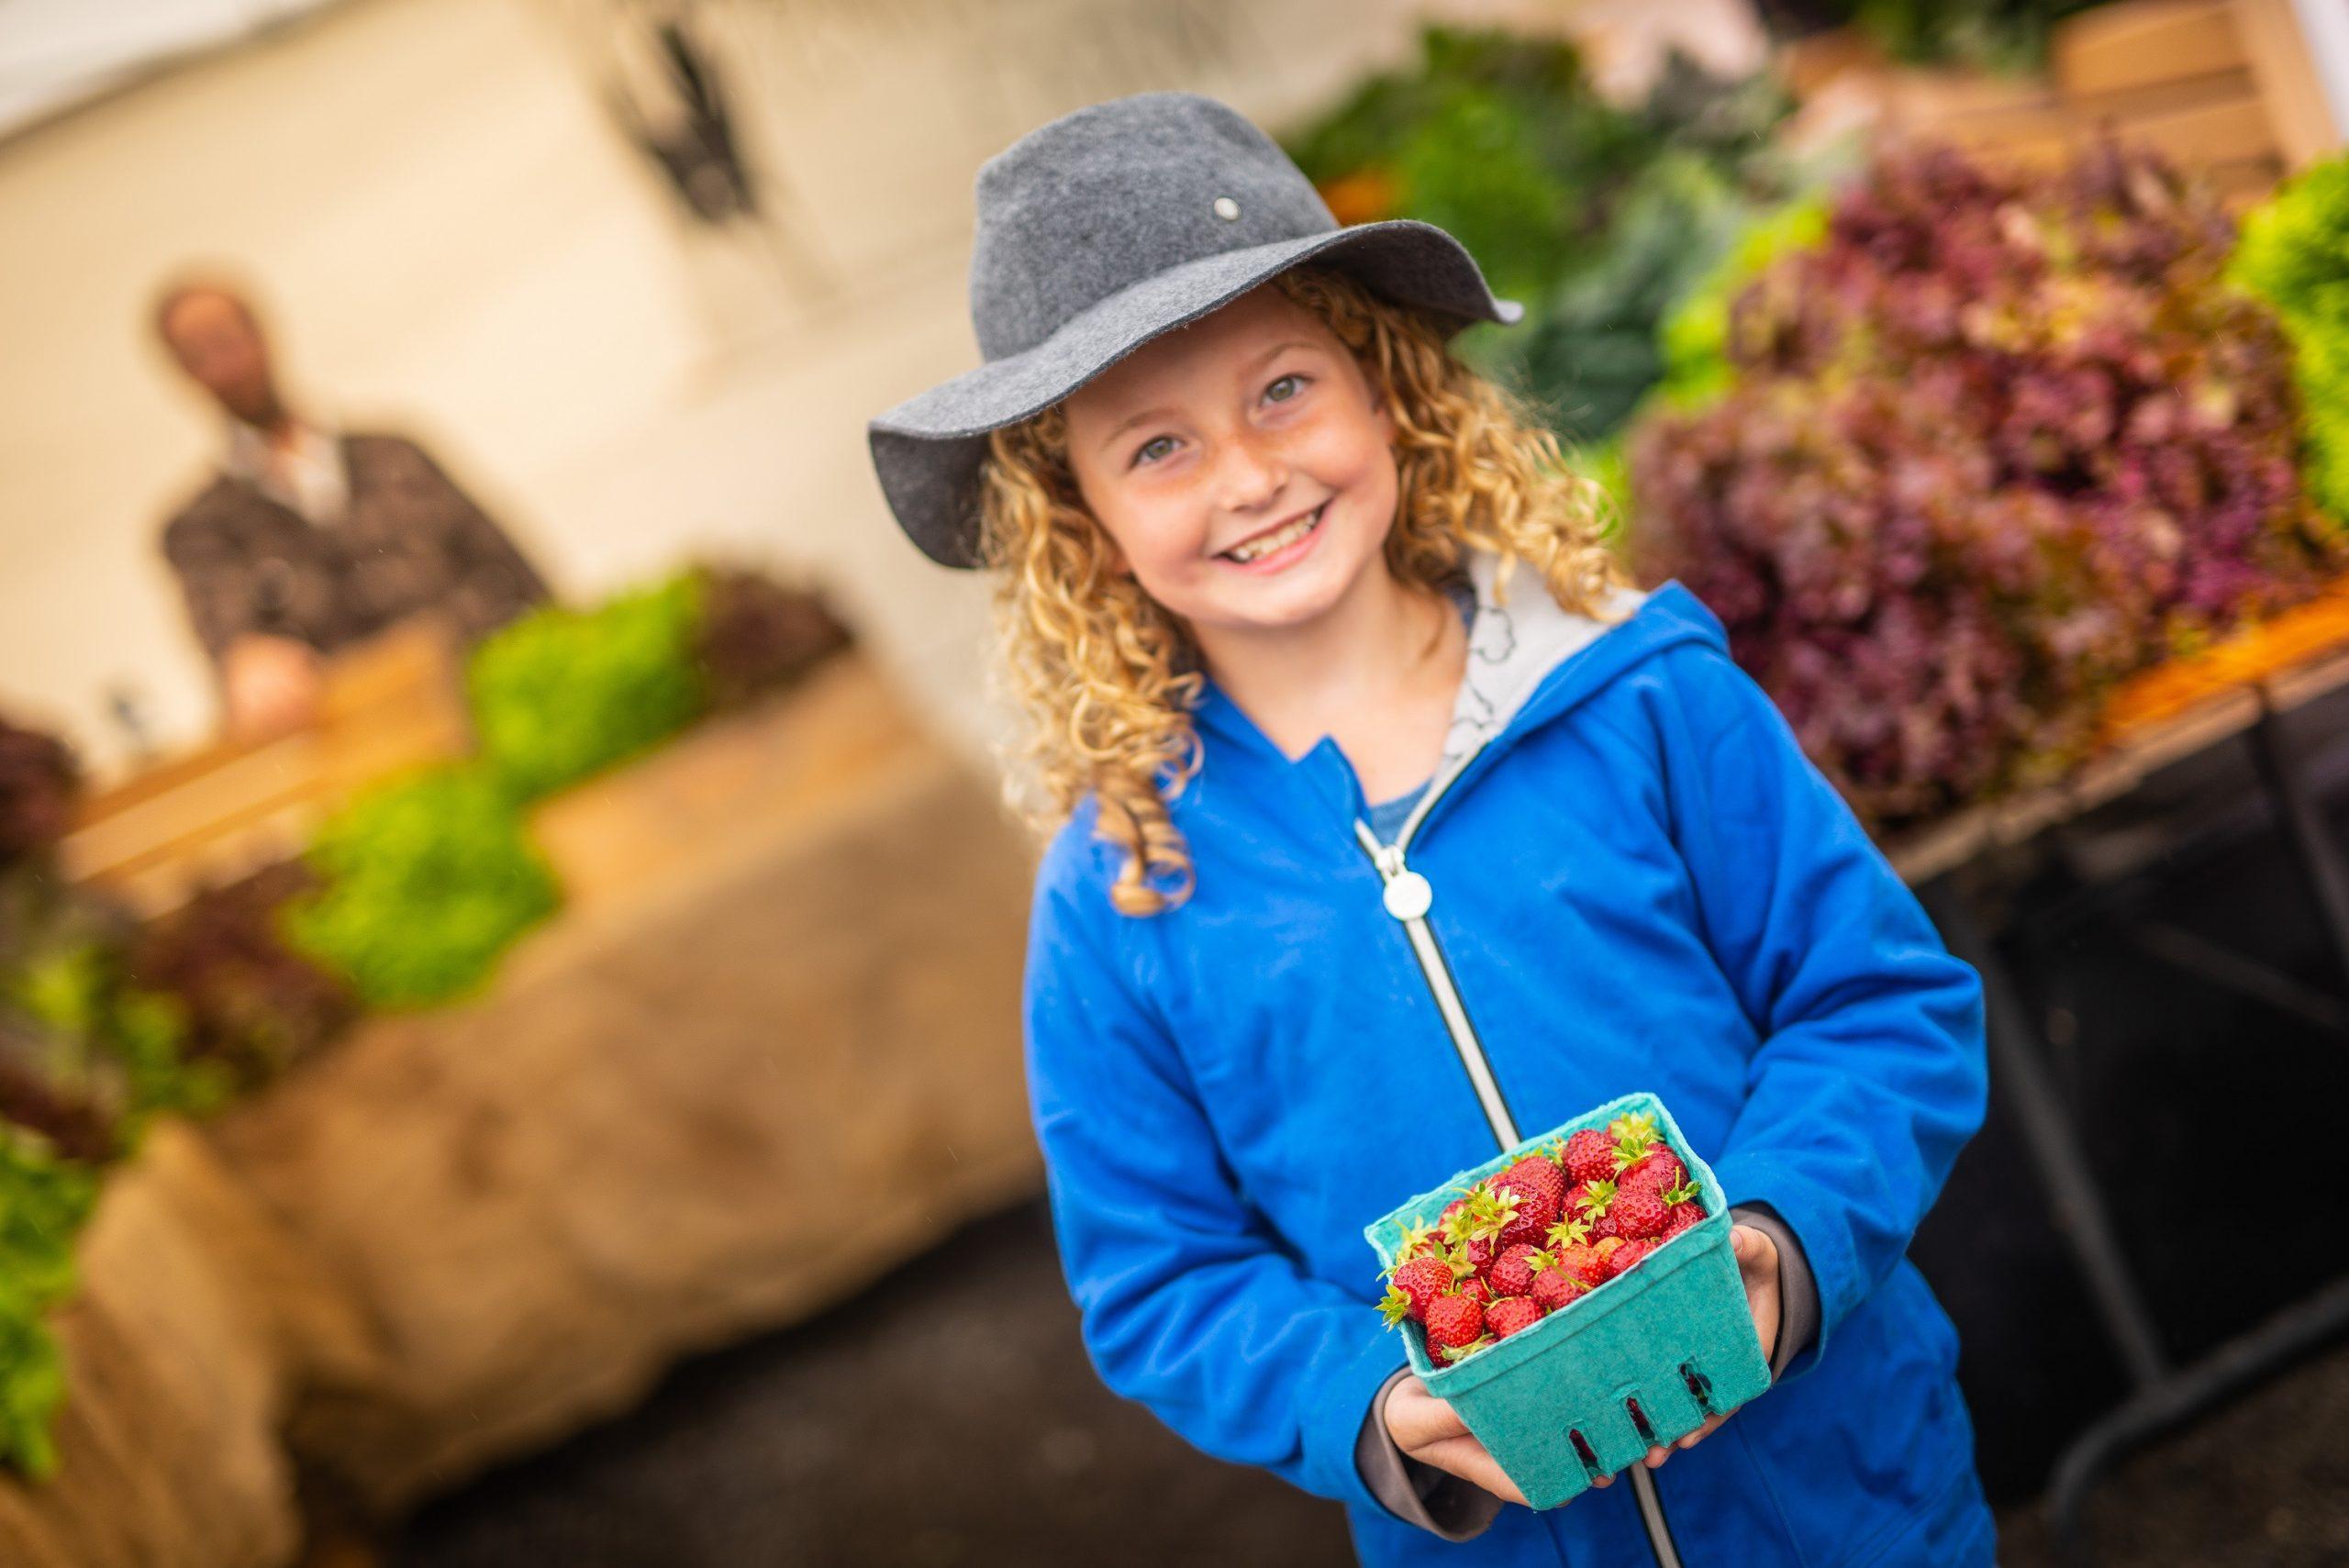 Kootenay Rockies & Columbia Basin Farmer's Market Trail launches online tool